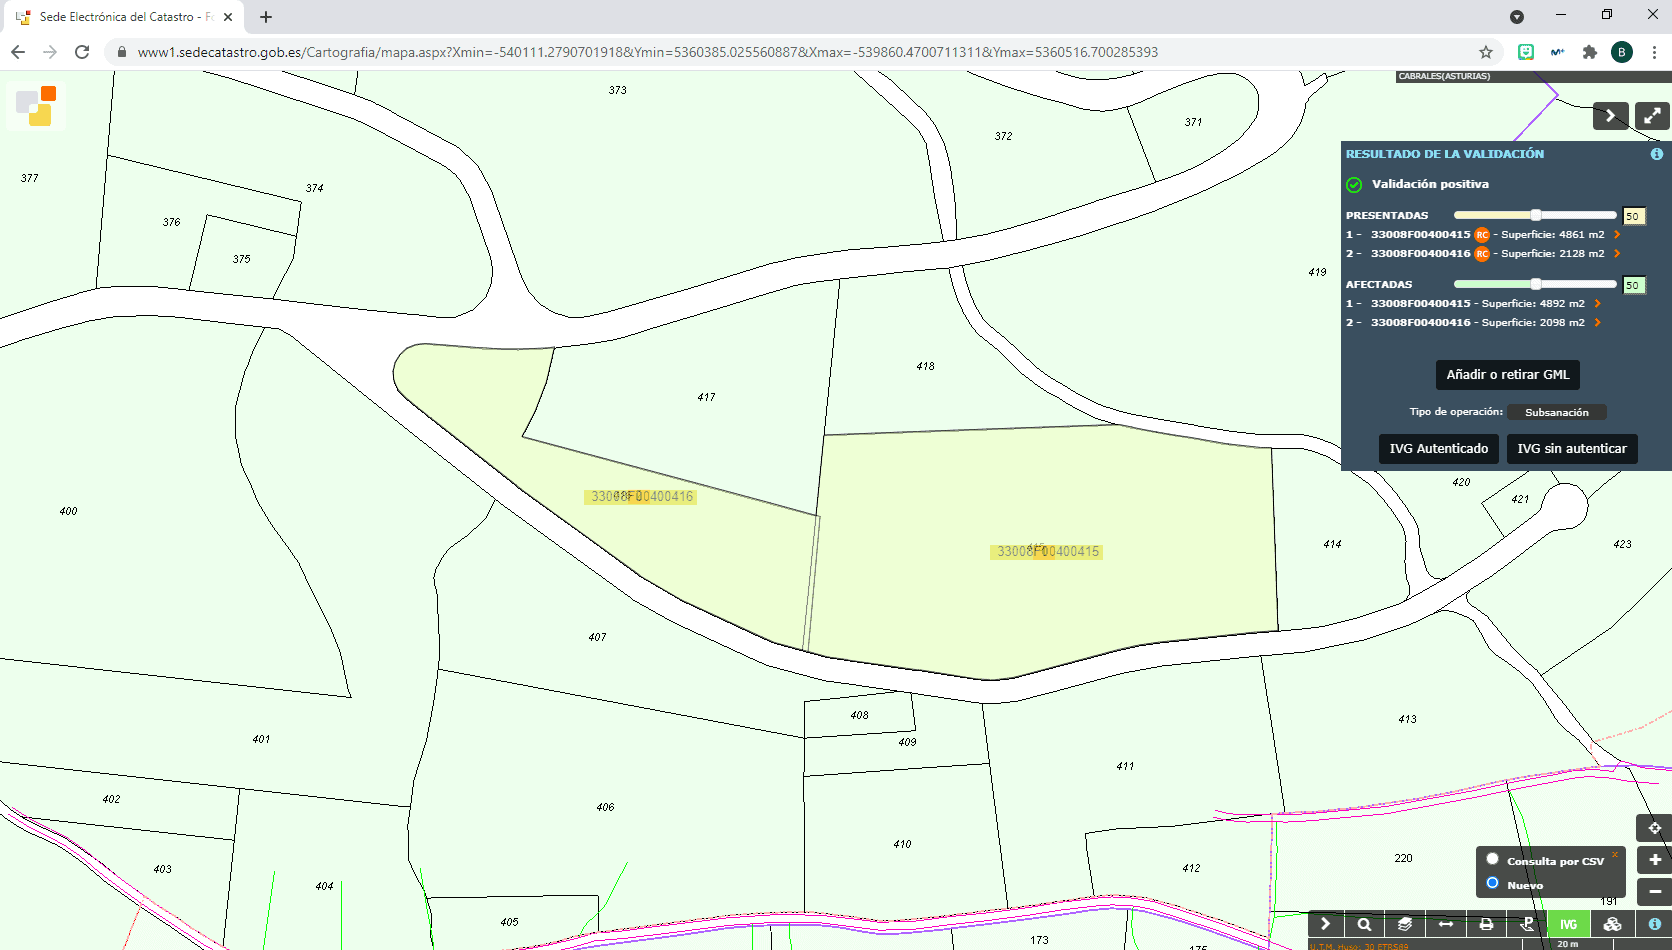 generar gml para catastro con qgis 19